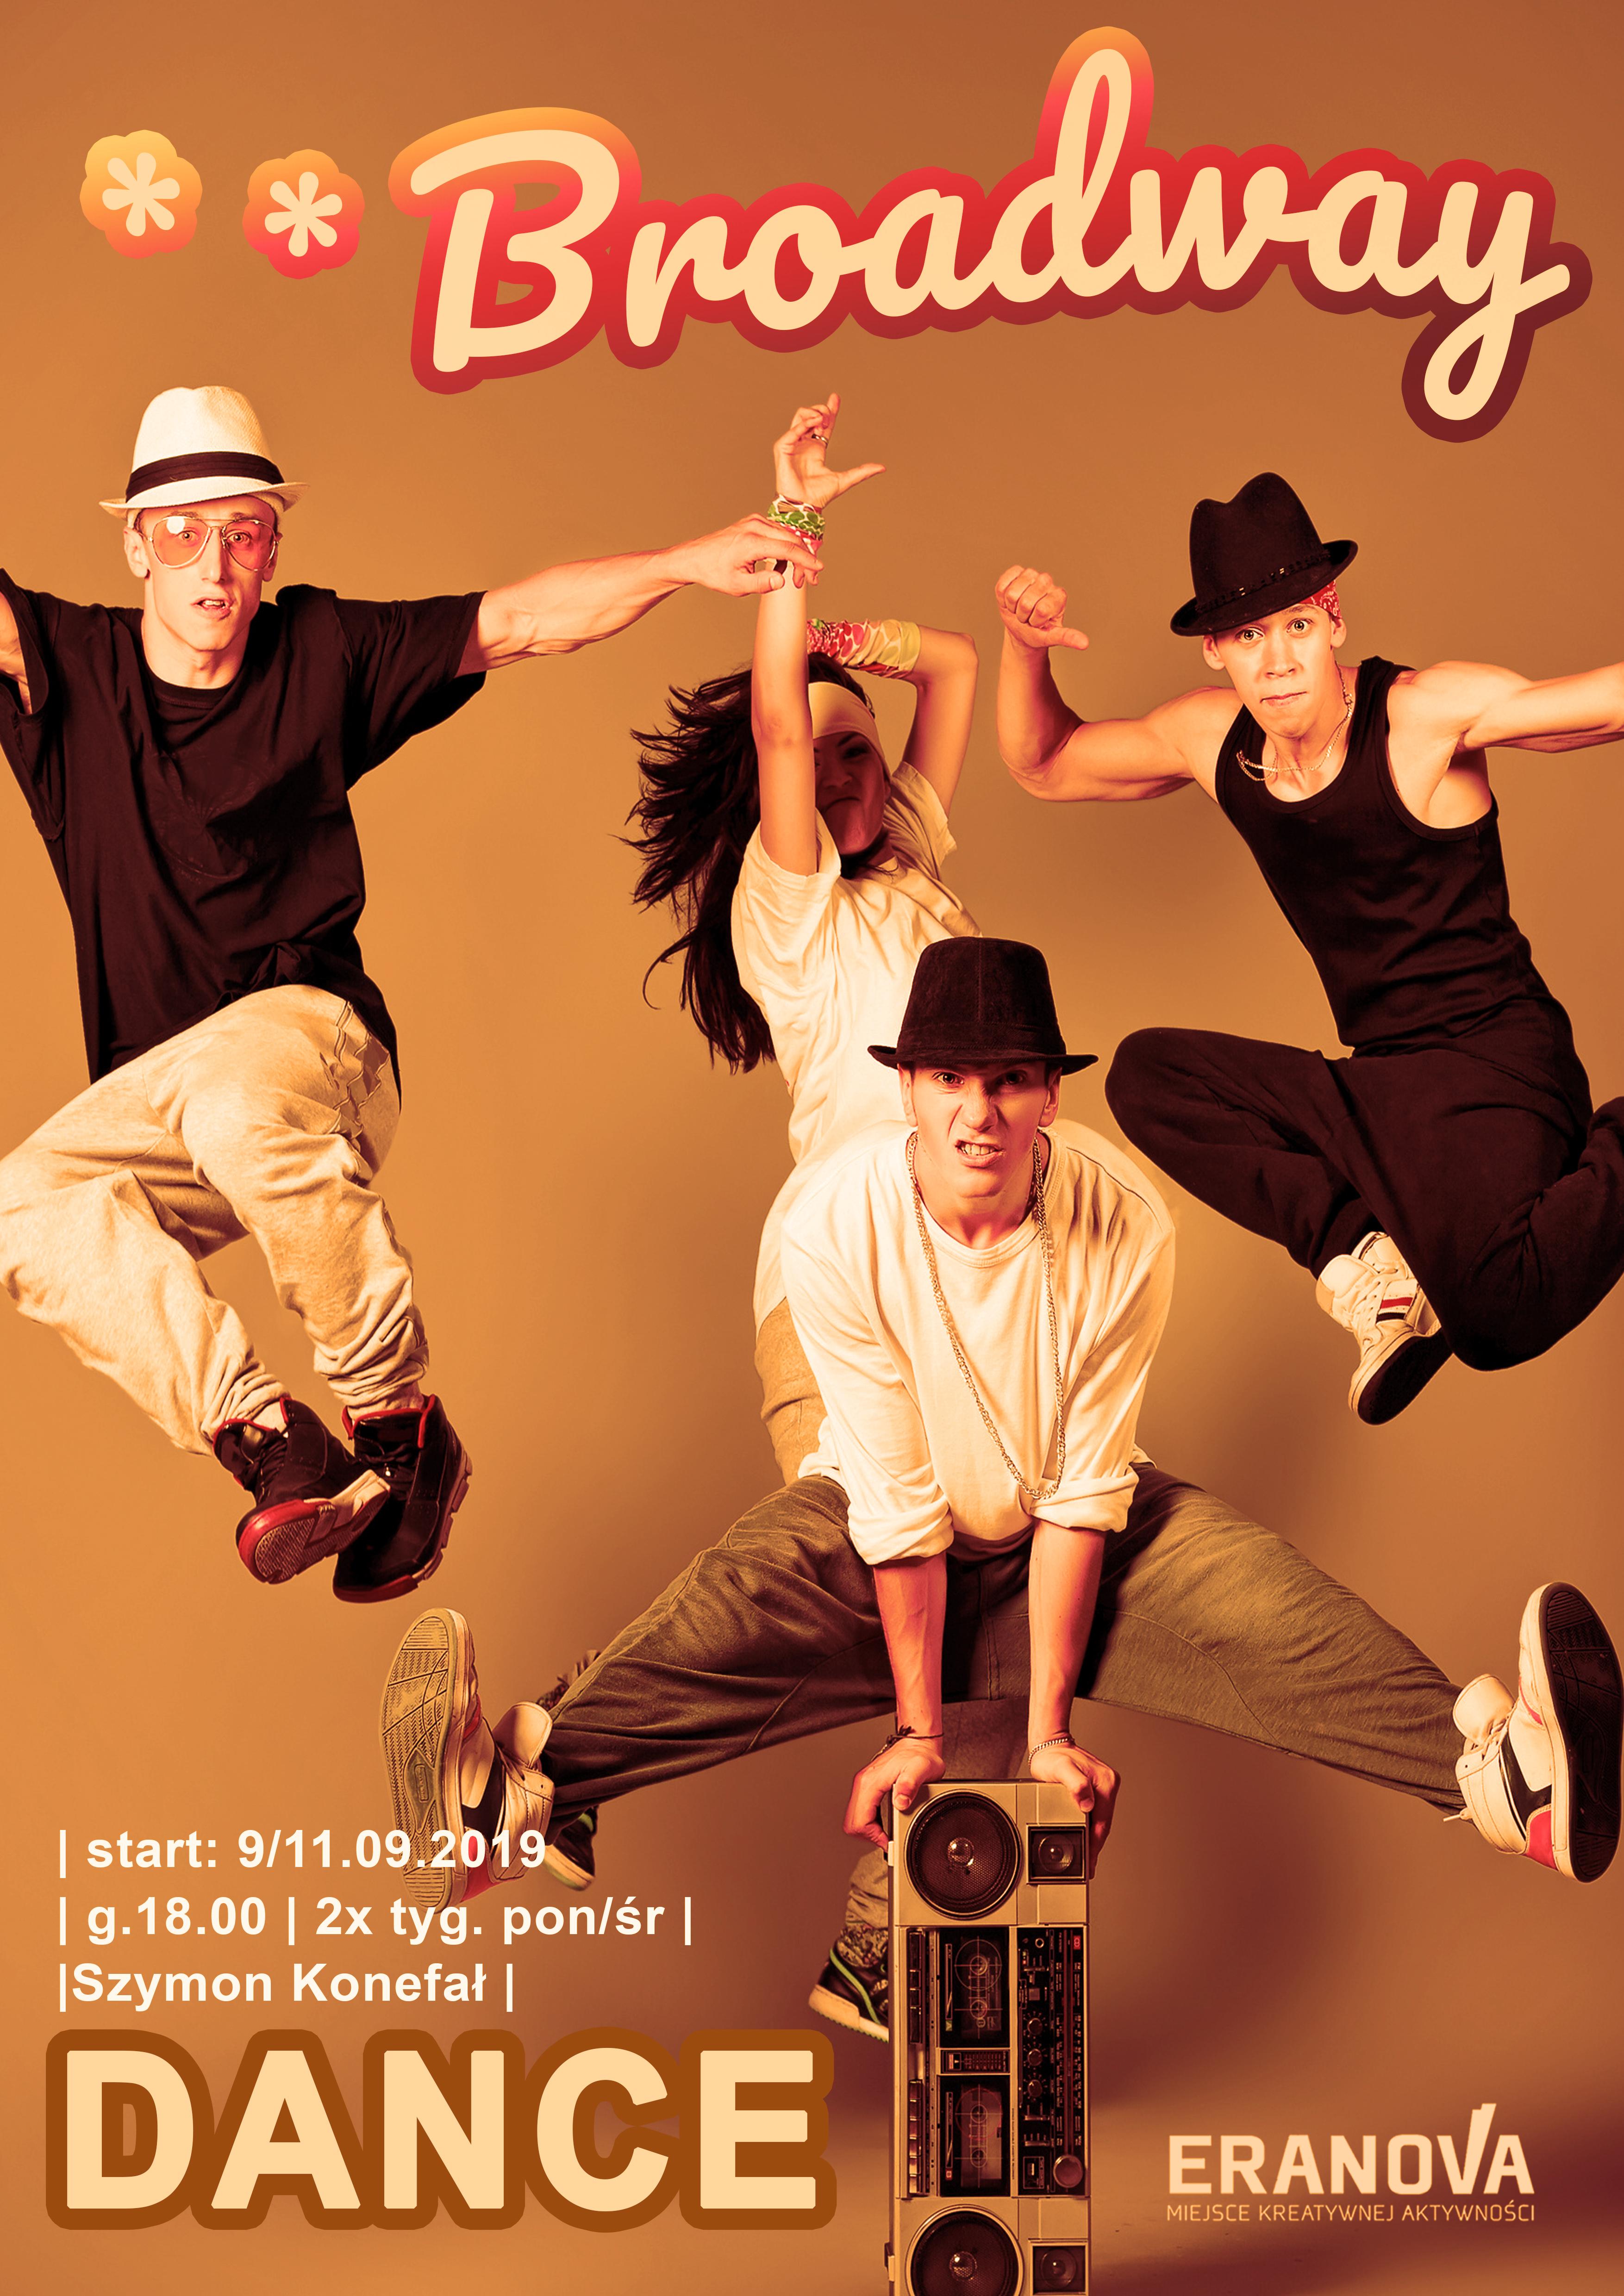 http://m.eranova.pl/2019/08/orig/broadway-dance-3050.jpg